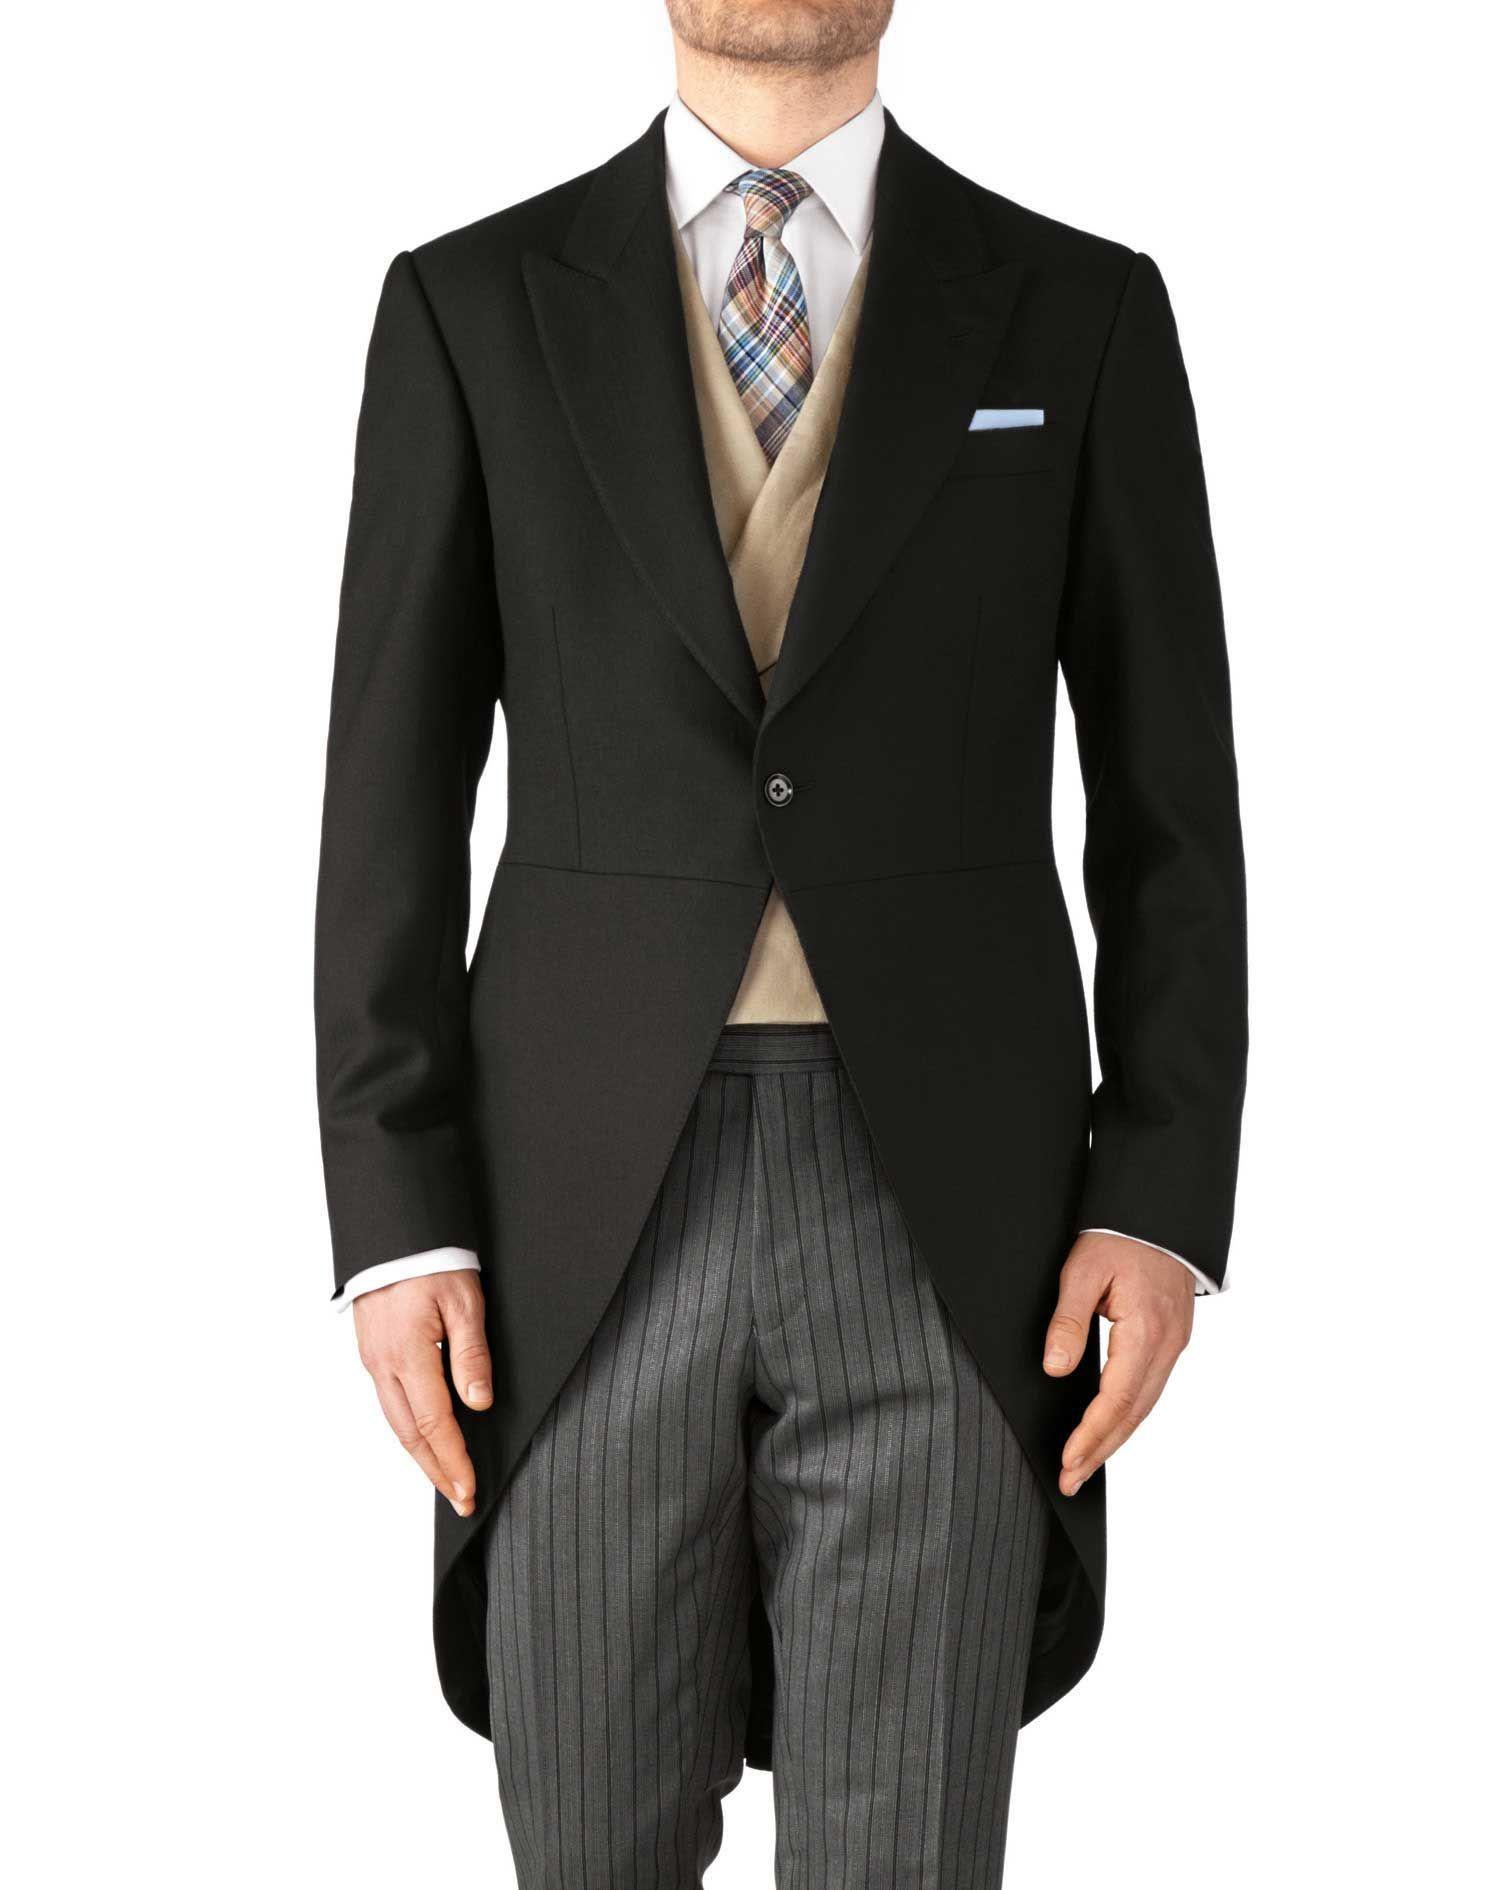 e40d55d24f63 Edwardian Titanic Mens Formal Suit Guide Charles Tyrwhitt Black classic fit herringbone  morning suit tail coat £229.00 AT vintagedancer.com